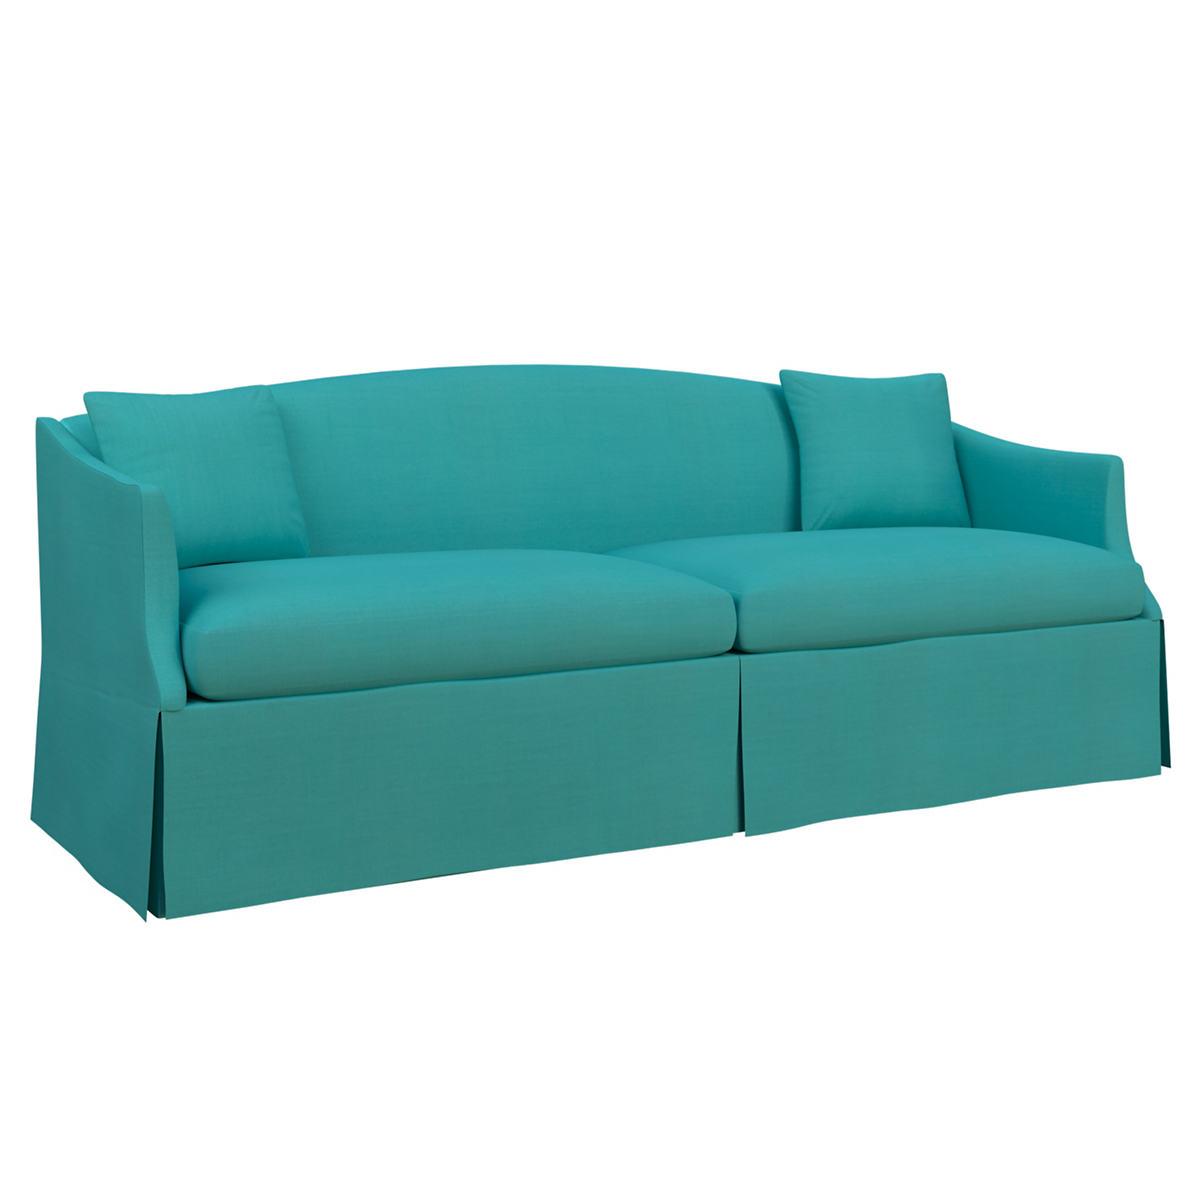 Estate Linen Turquoise Avignon Sofa